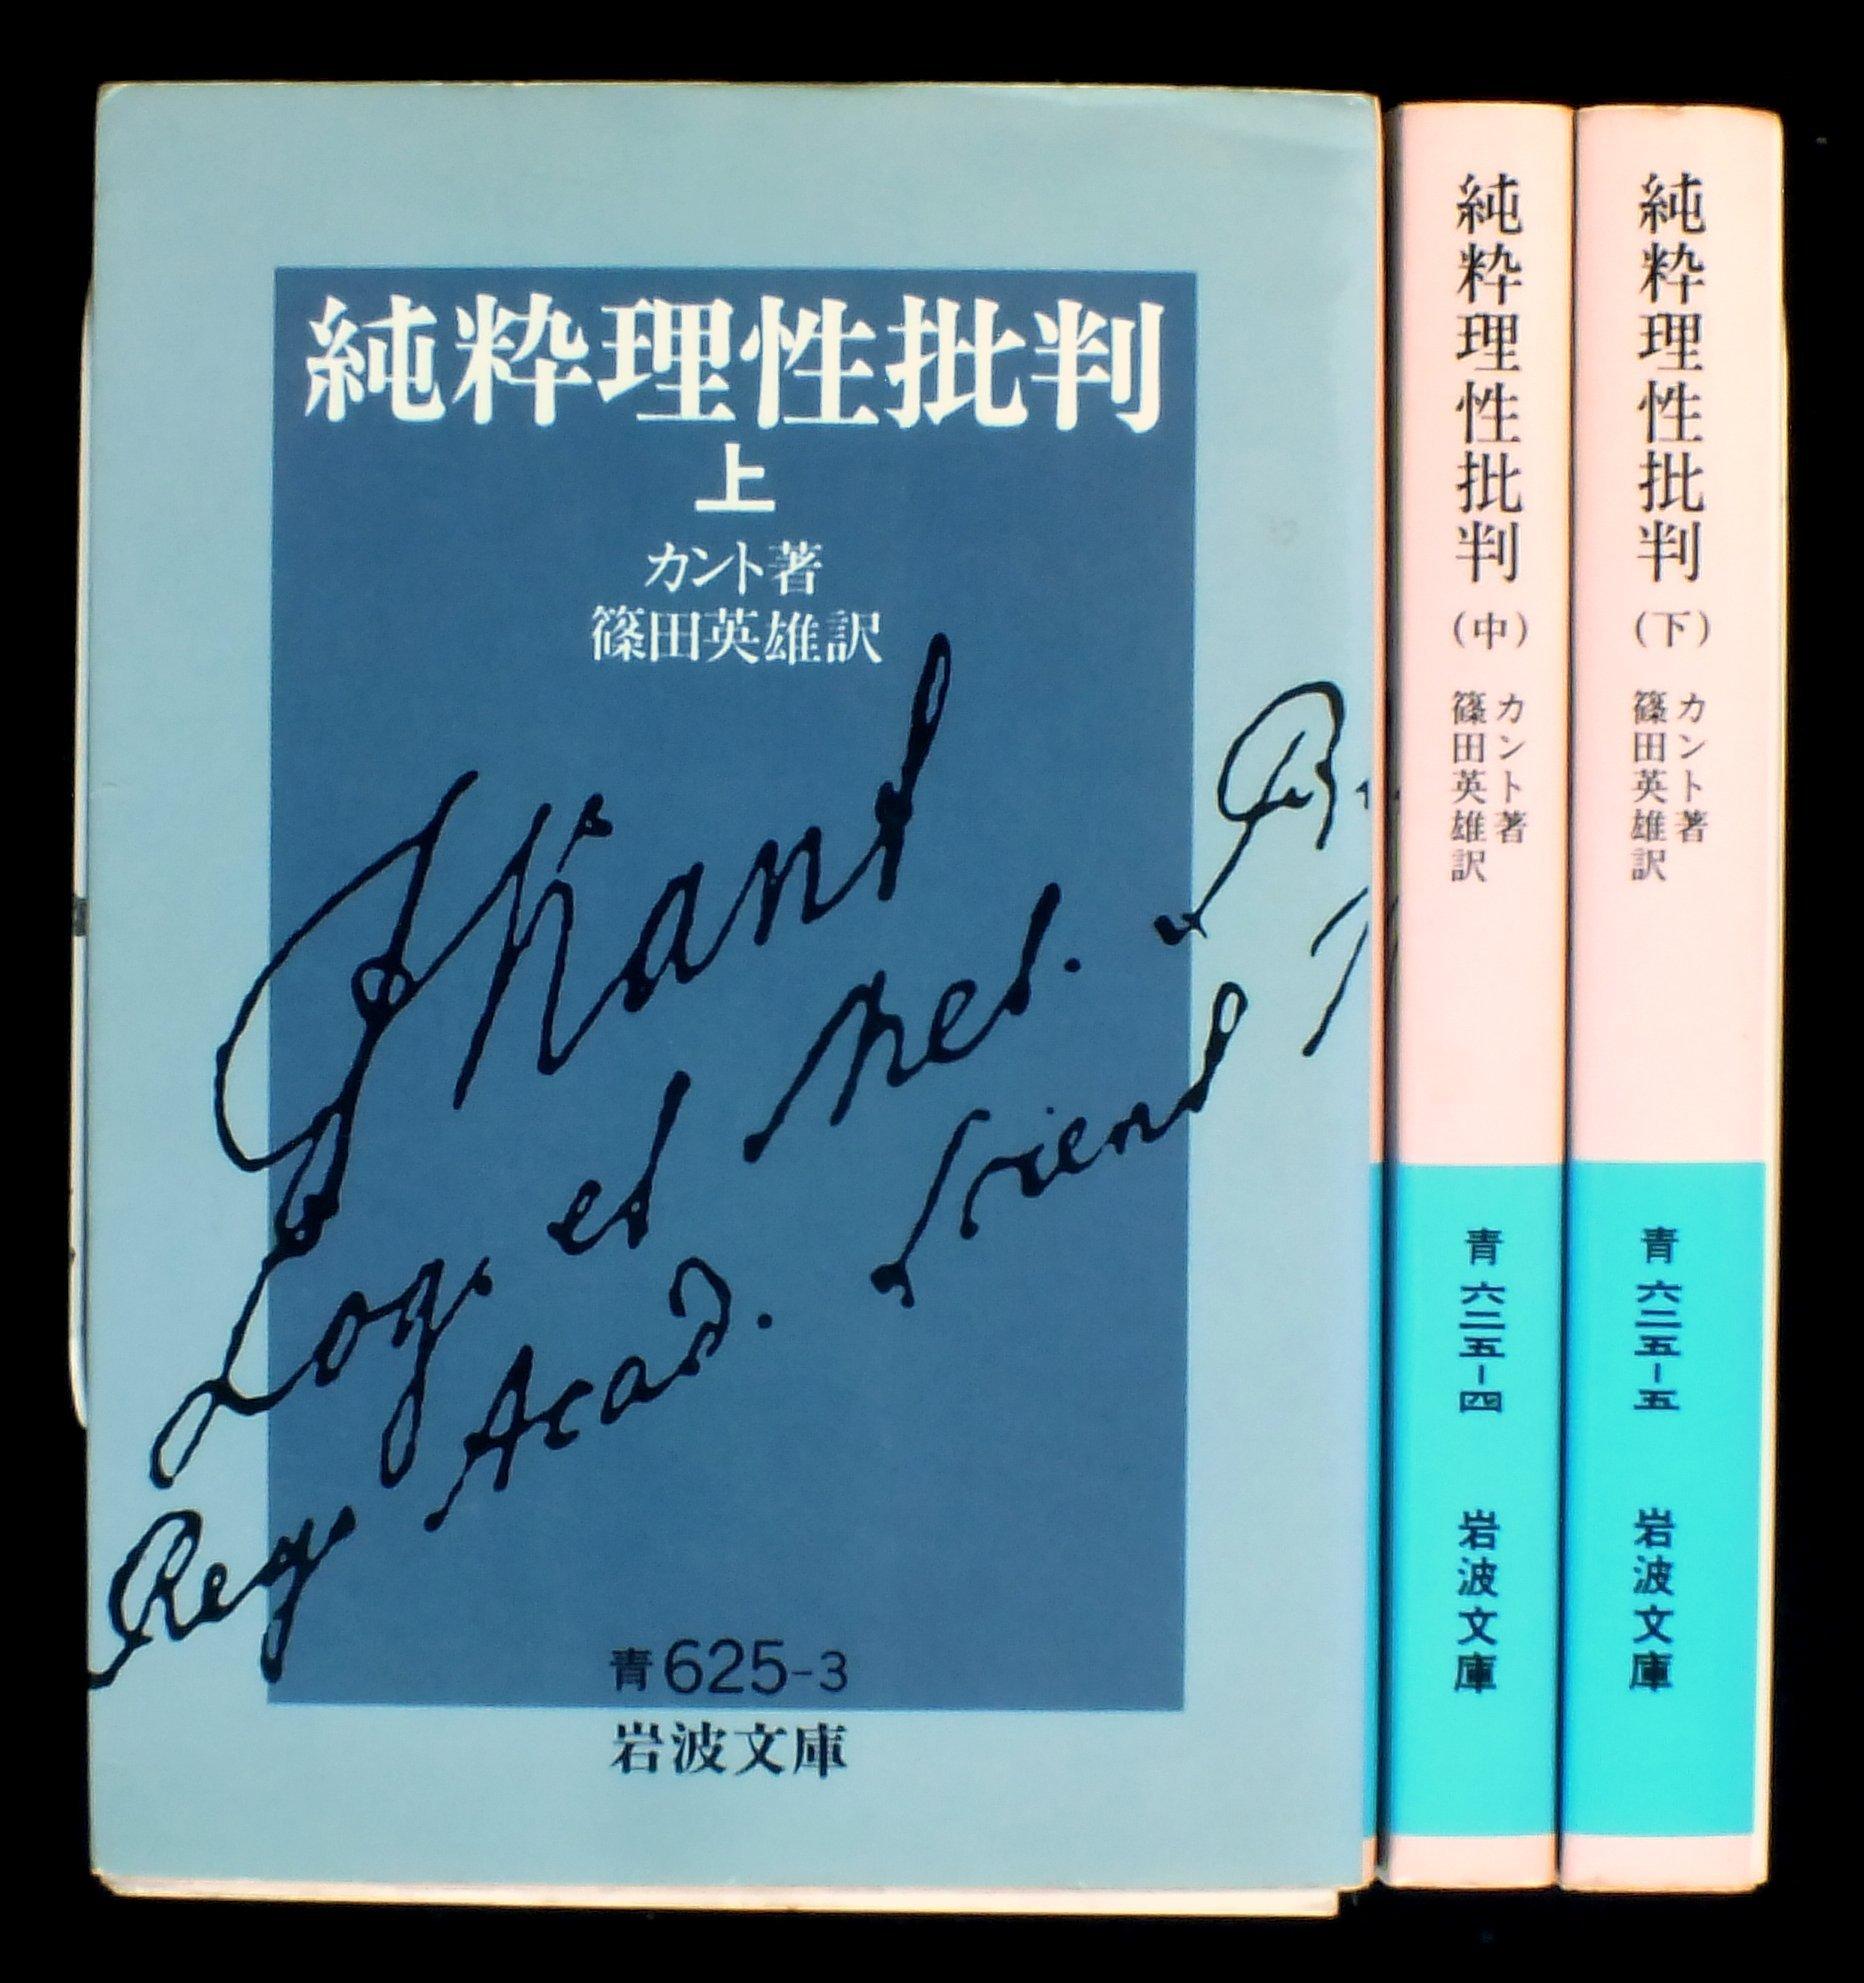 Amazon.co.jp: 純粋理性批判 上中下巻セット (岩波文庫): カント ...